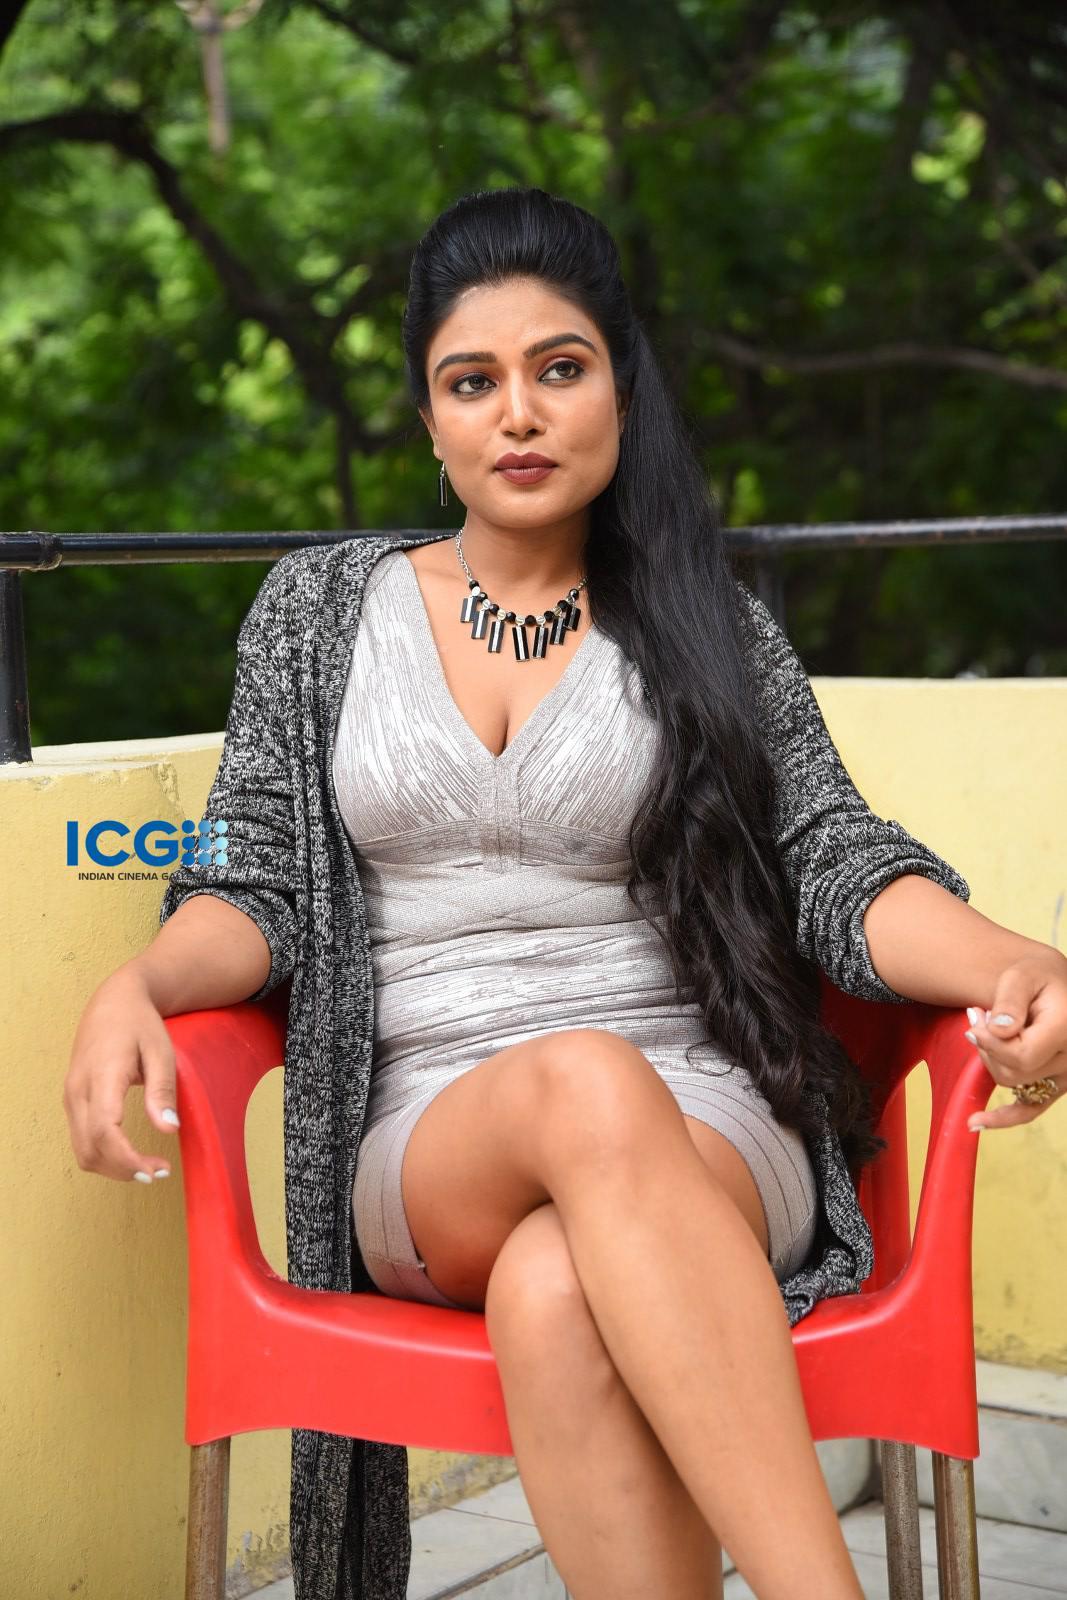 Actress Neelam Naina Stills (18)